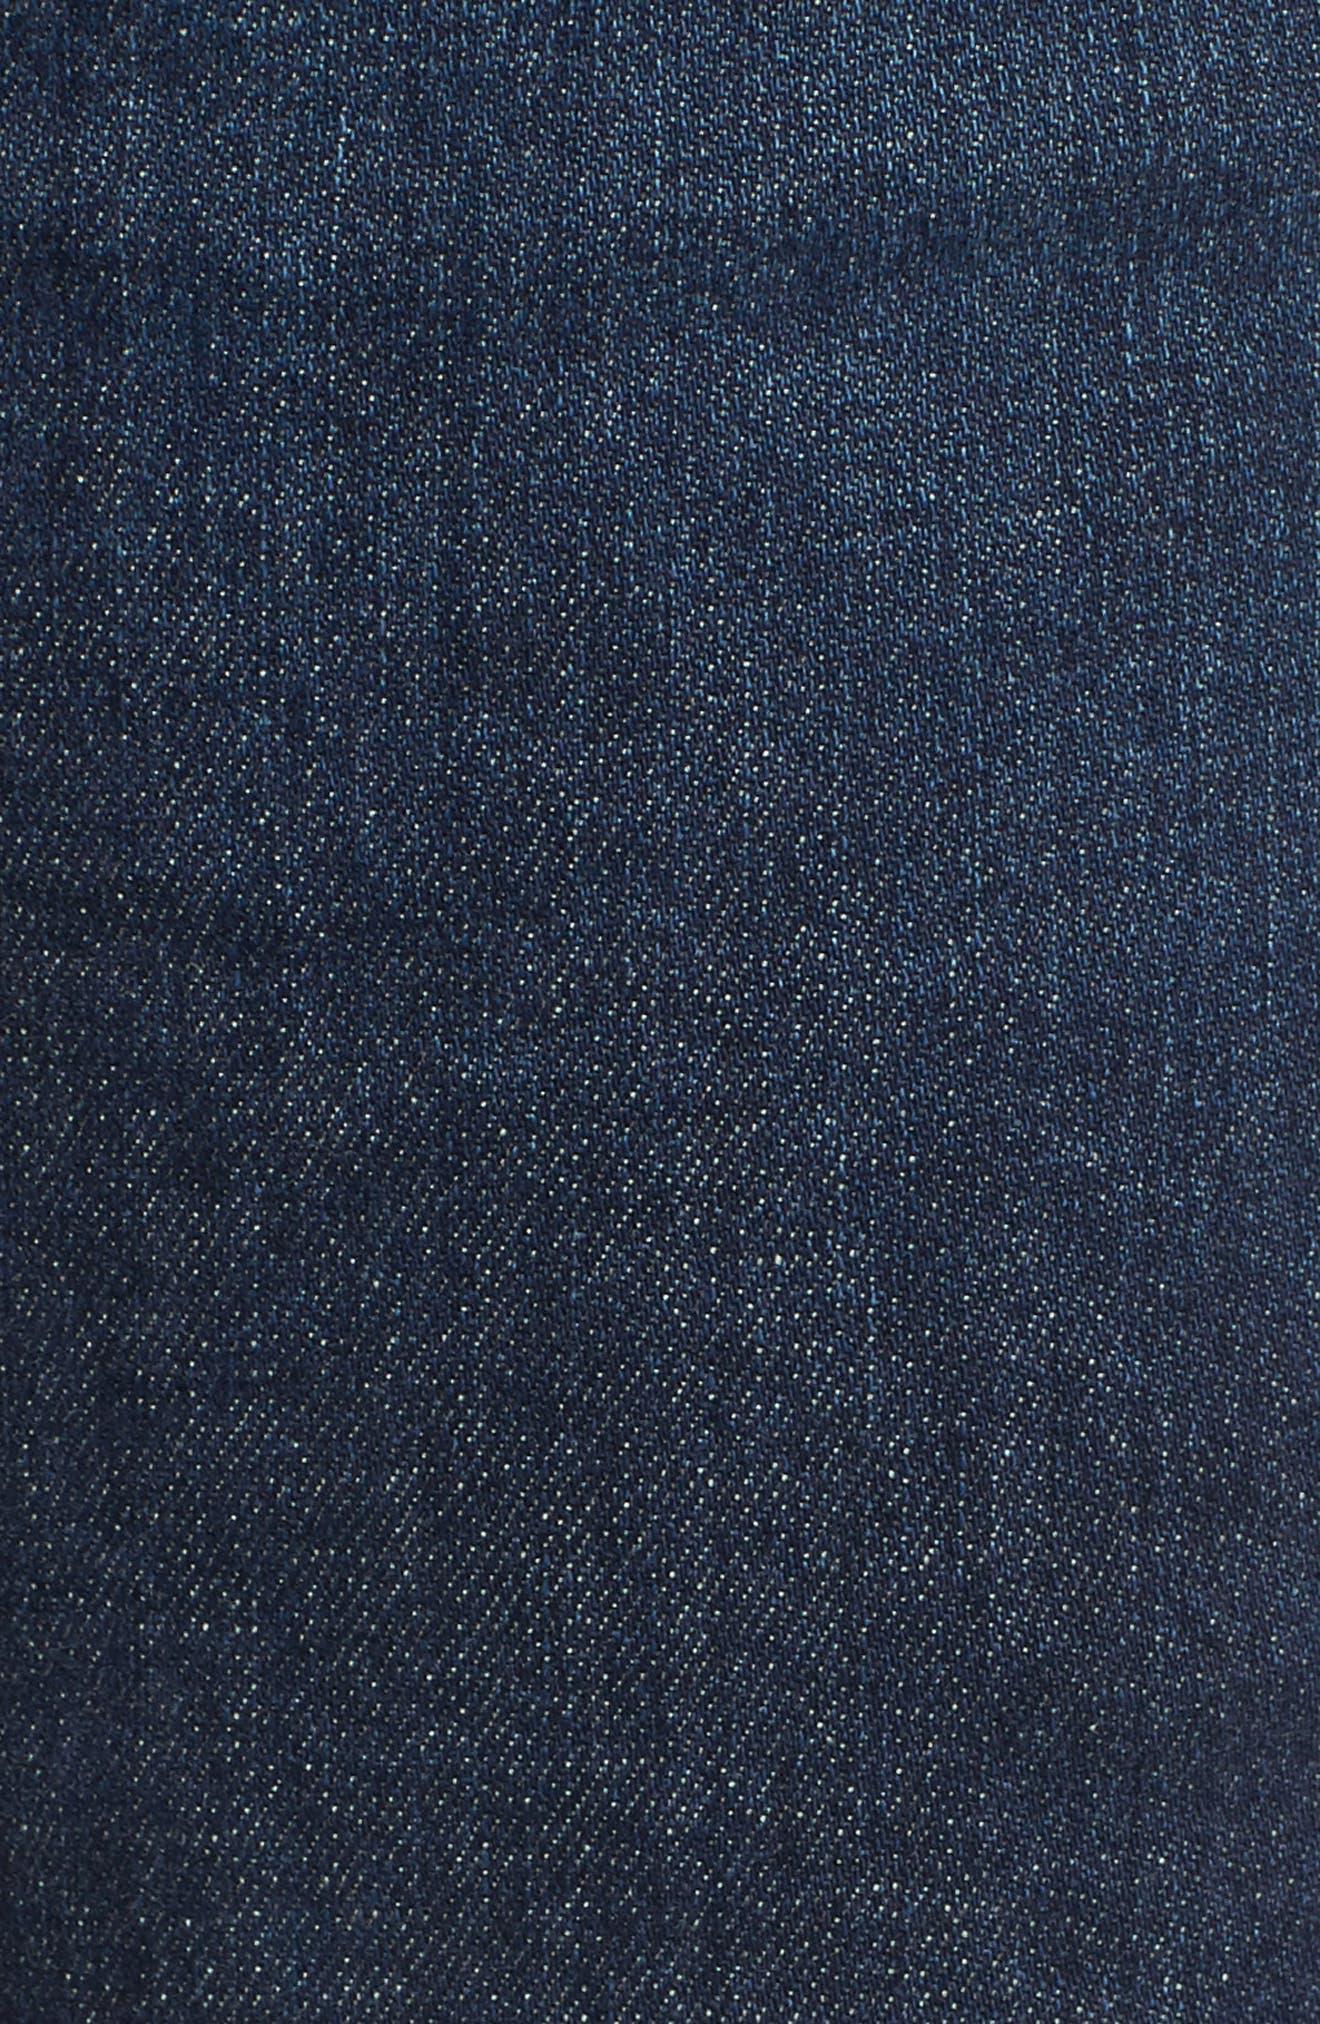 L'Homme Skinny Jeans,                             Alternate thumbnail 5, color,                             Loris